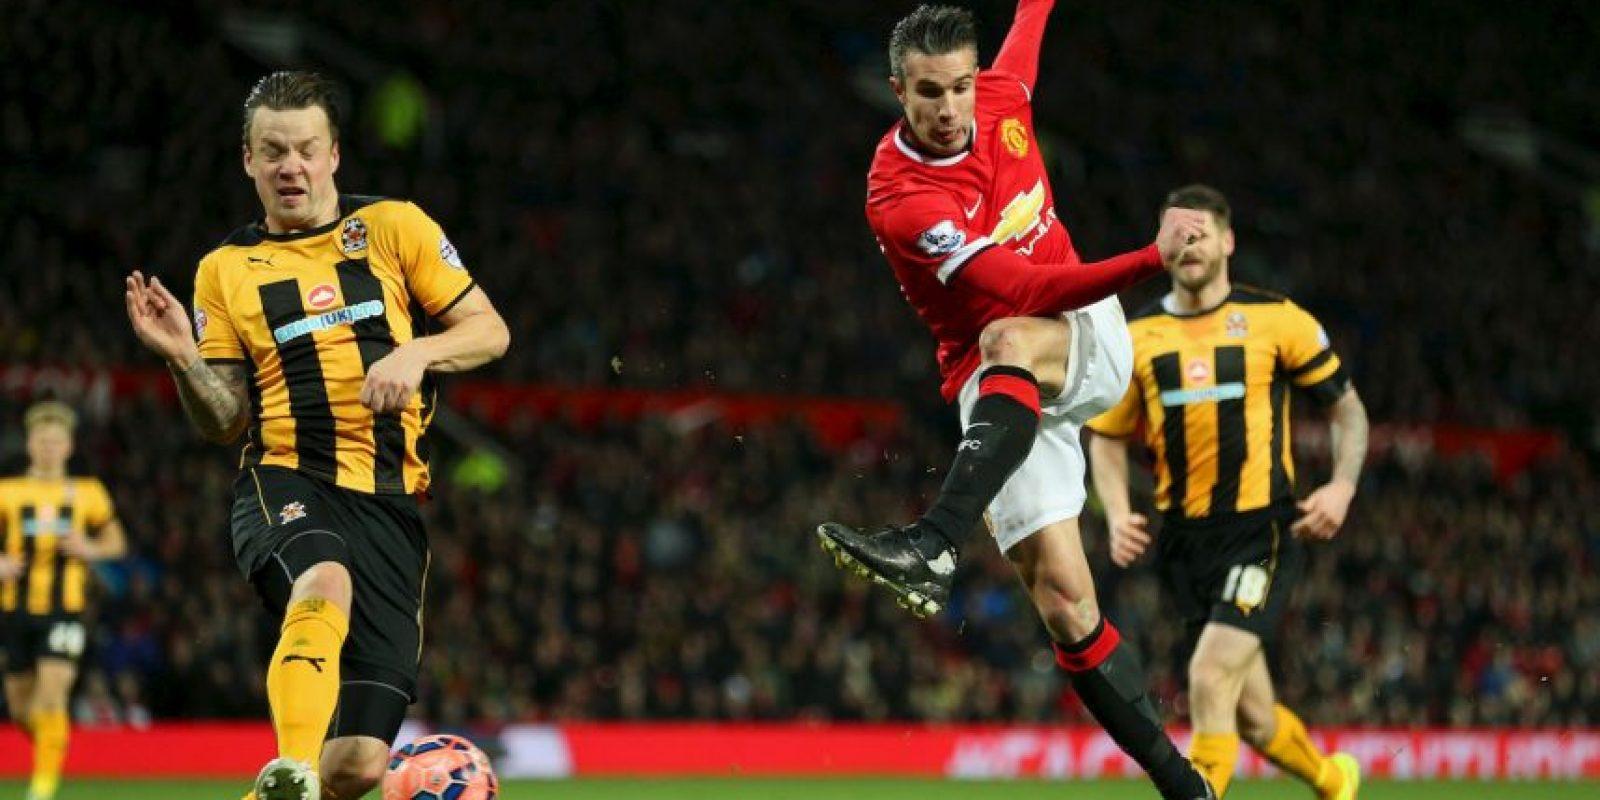 El holandés está en el Manchester United Foto:Getty Images